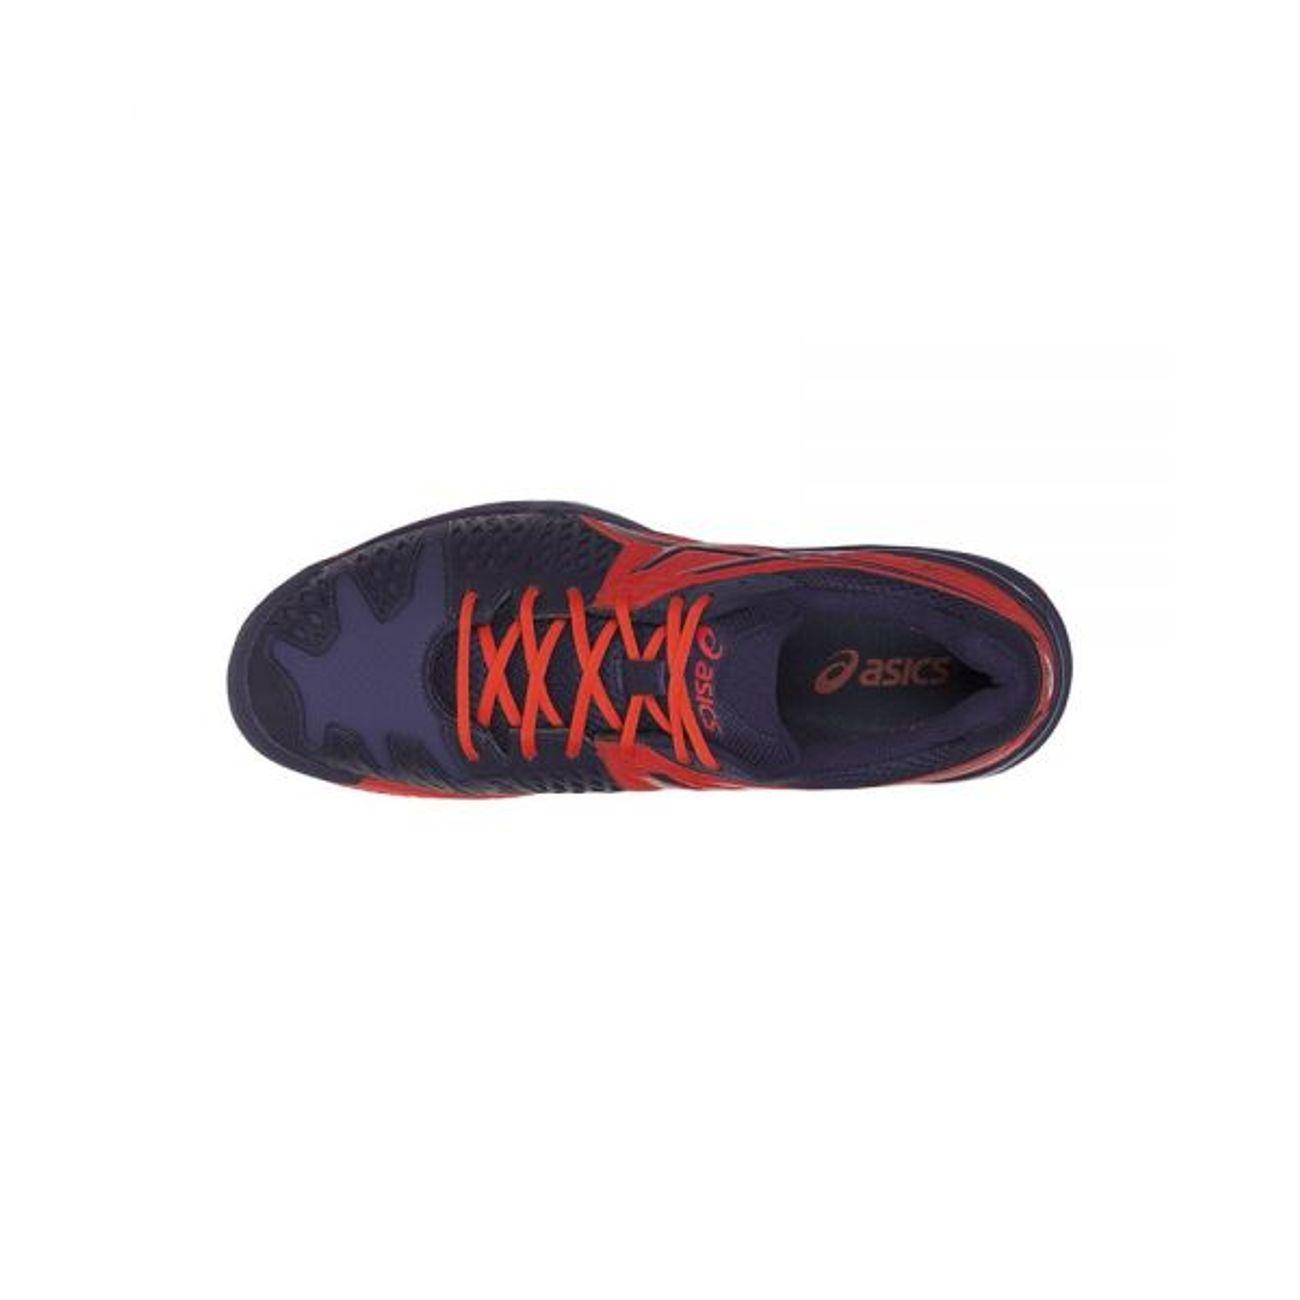 Chaussures Padel Gel Padel Homme Asics Homme I6gyv7bYf